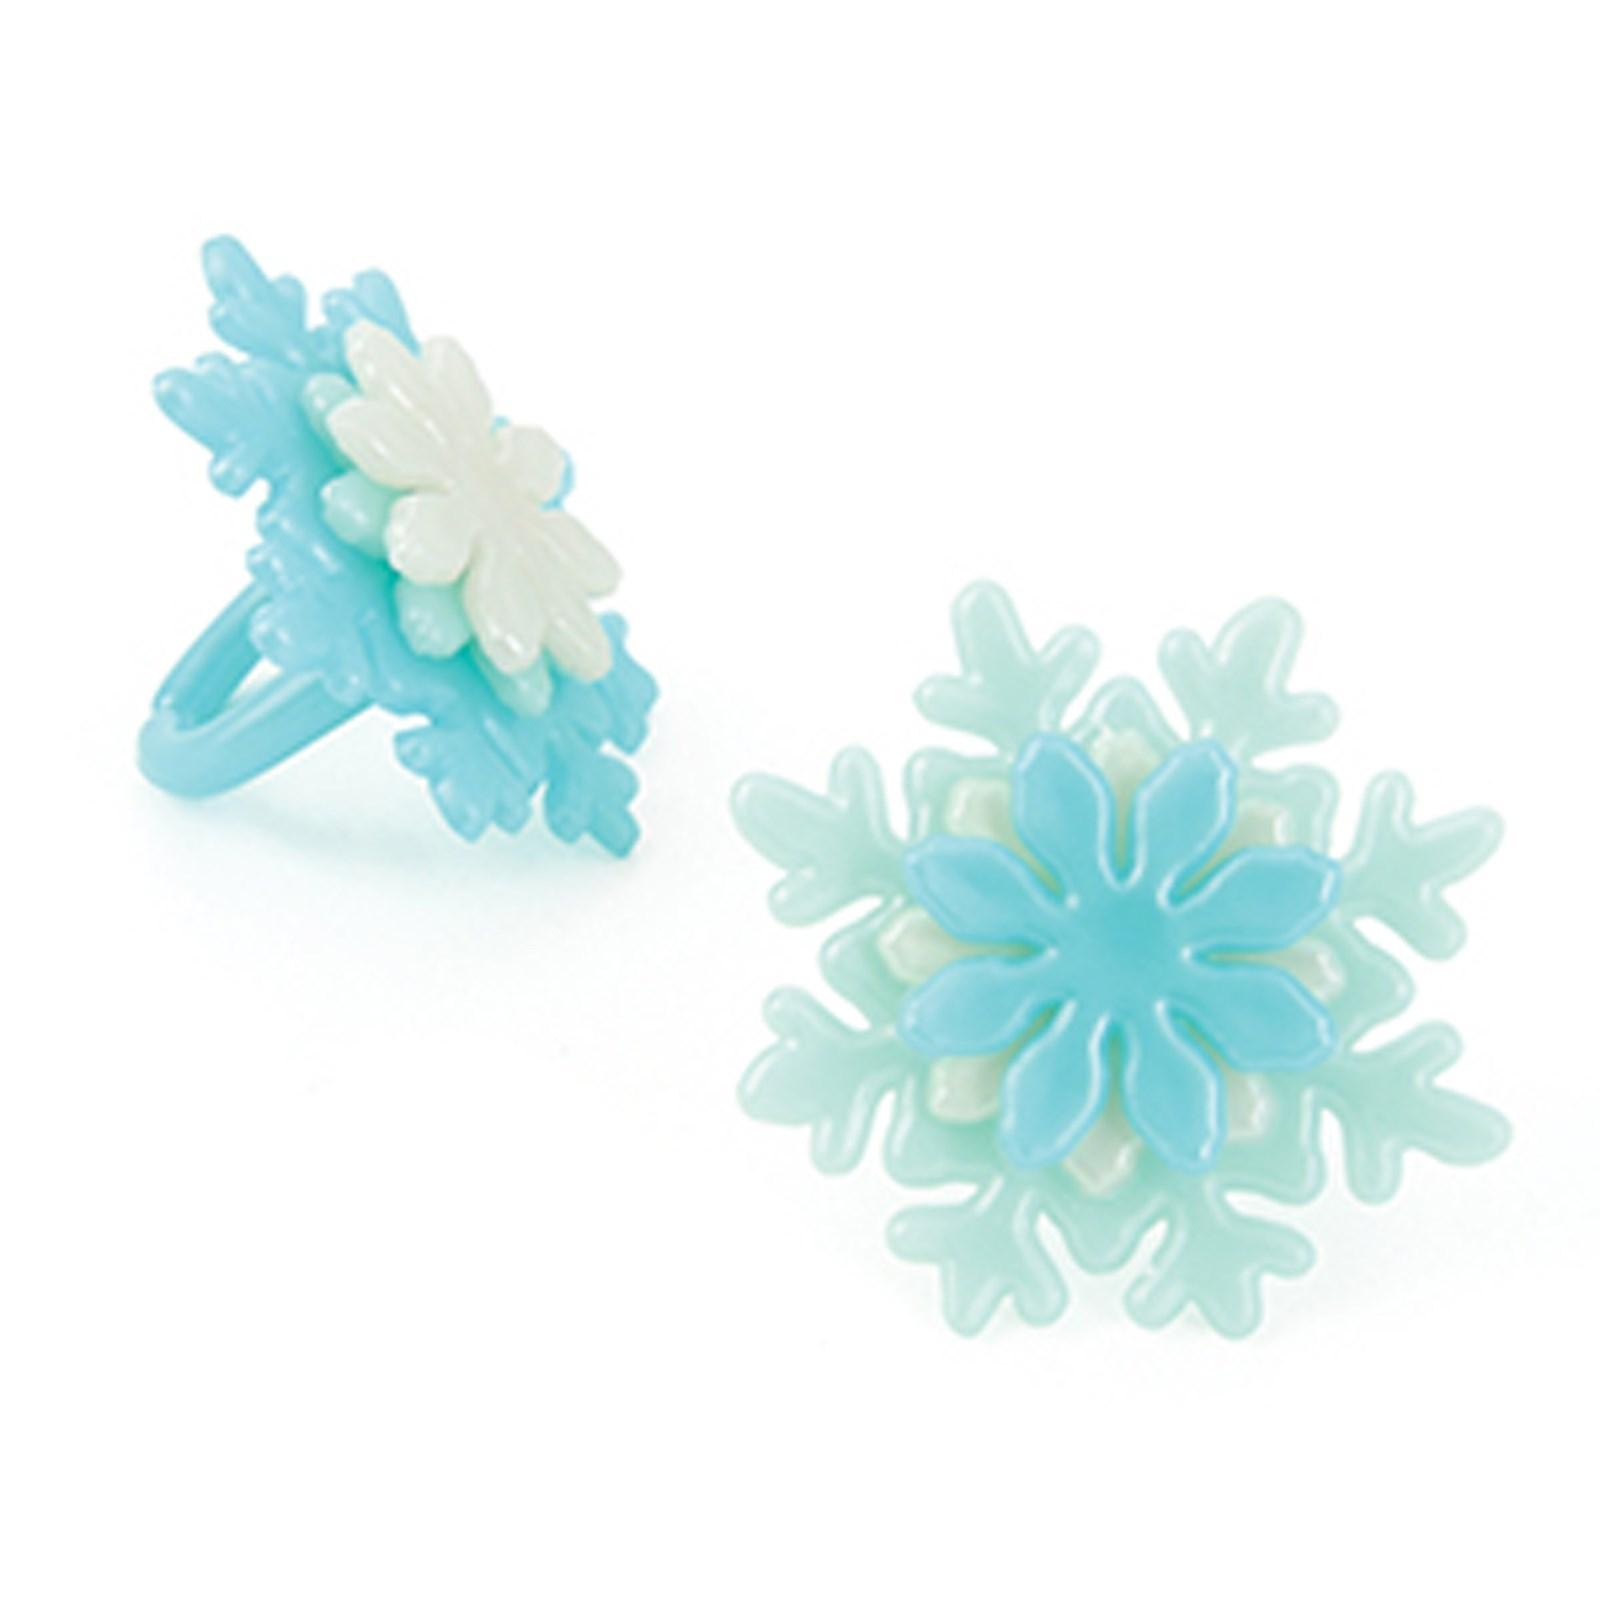 Image of Iridescent Snowflake Rings (12)